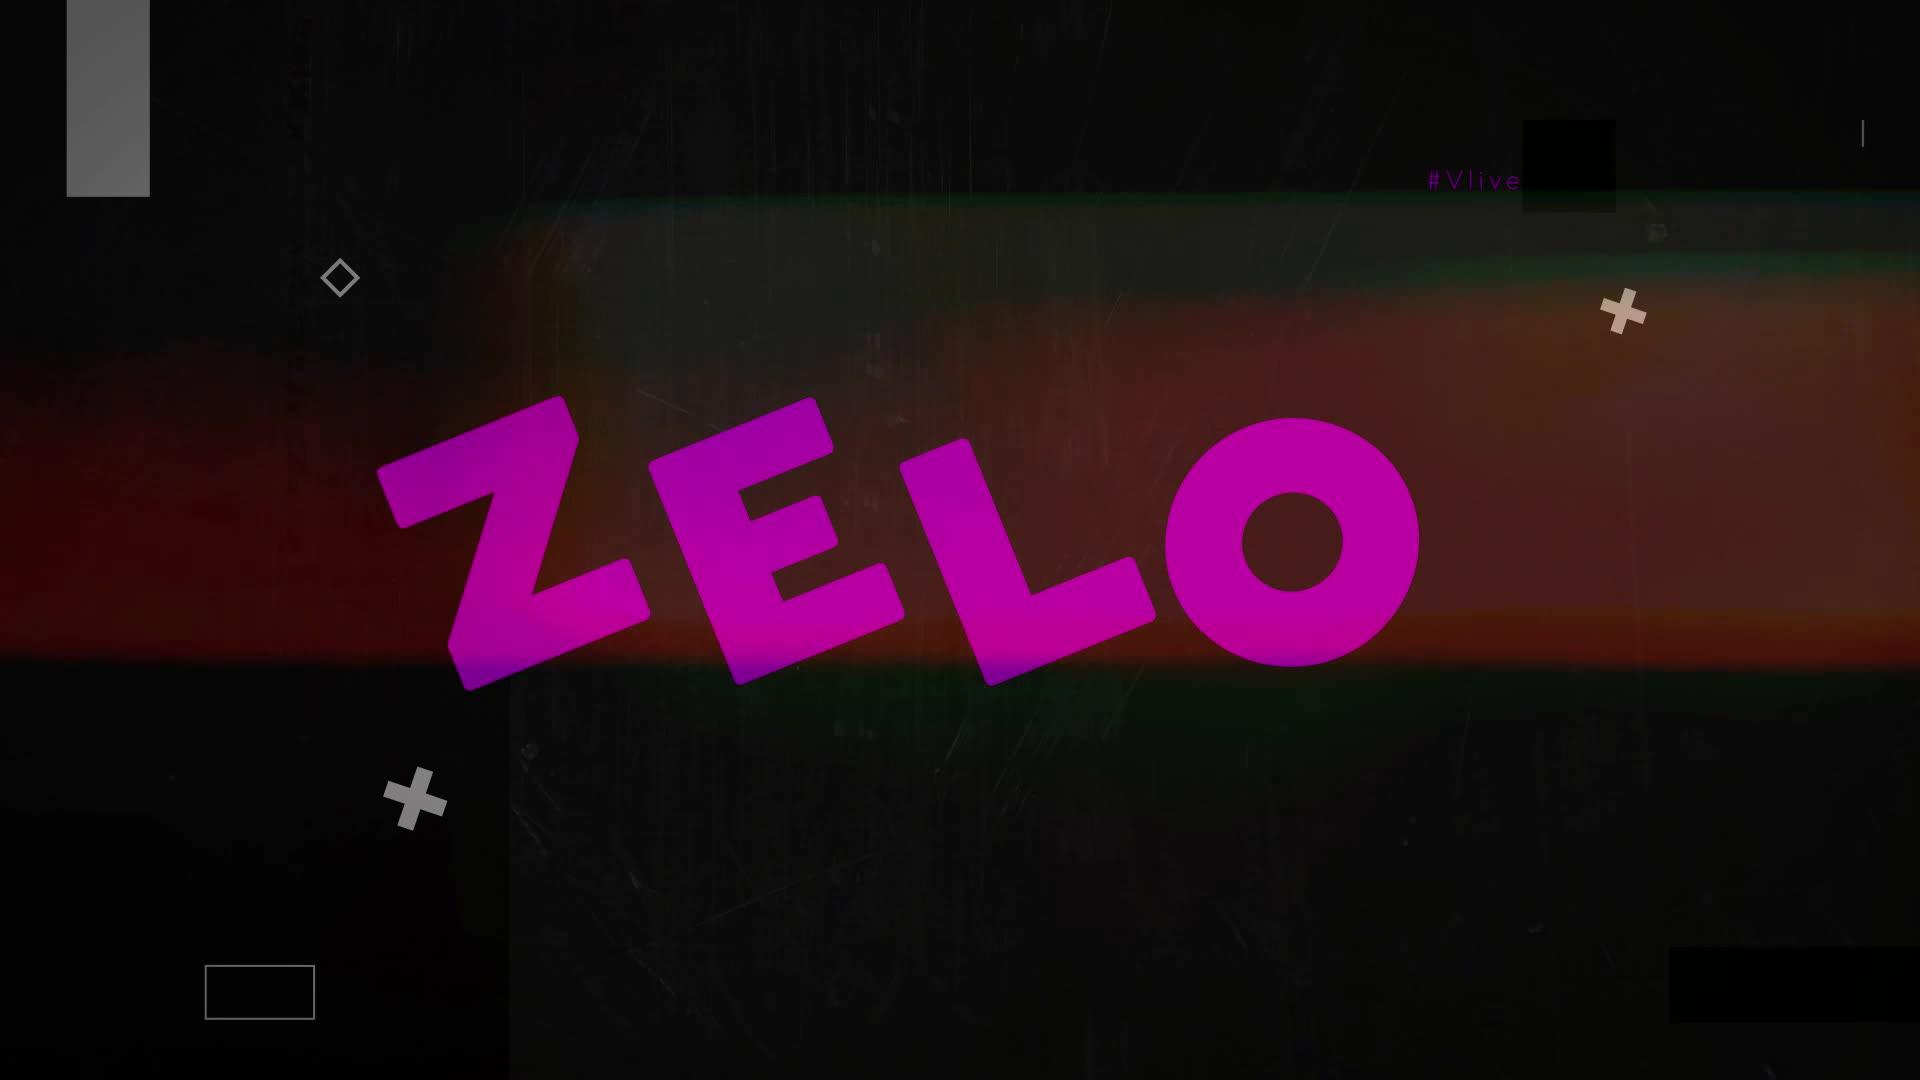 ZELO V-LIVE CHANNEL OPEN!!!